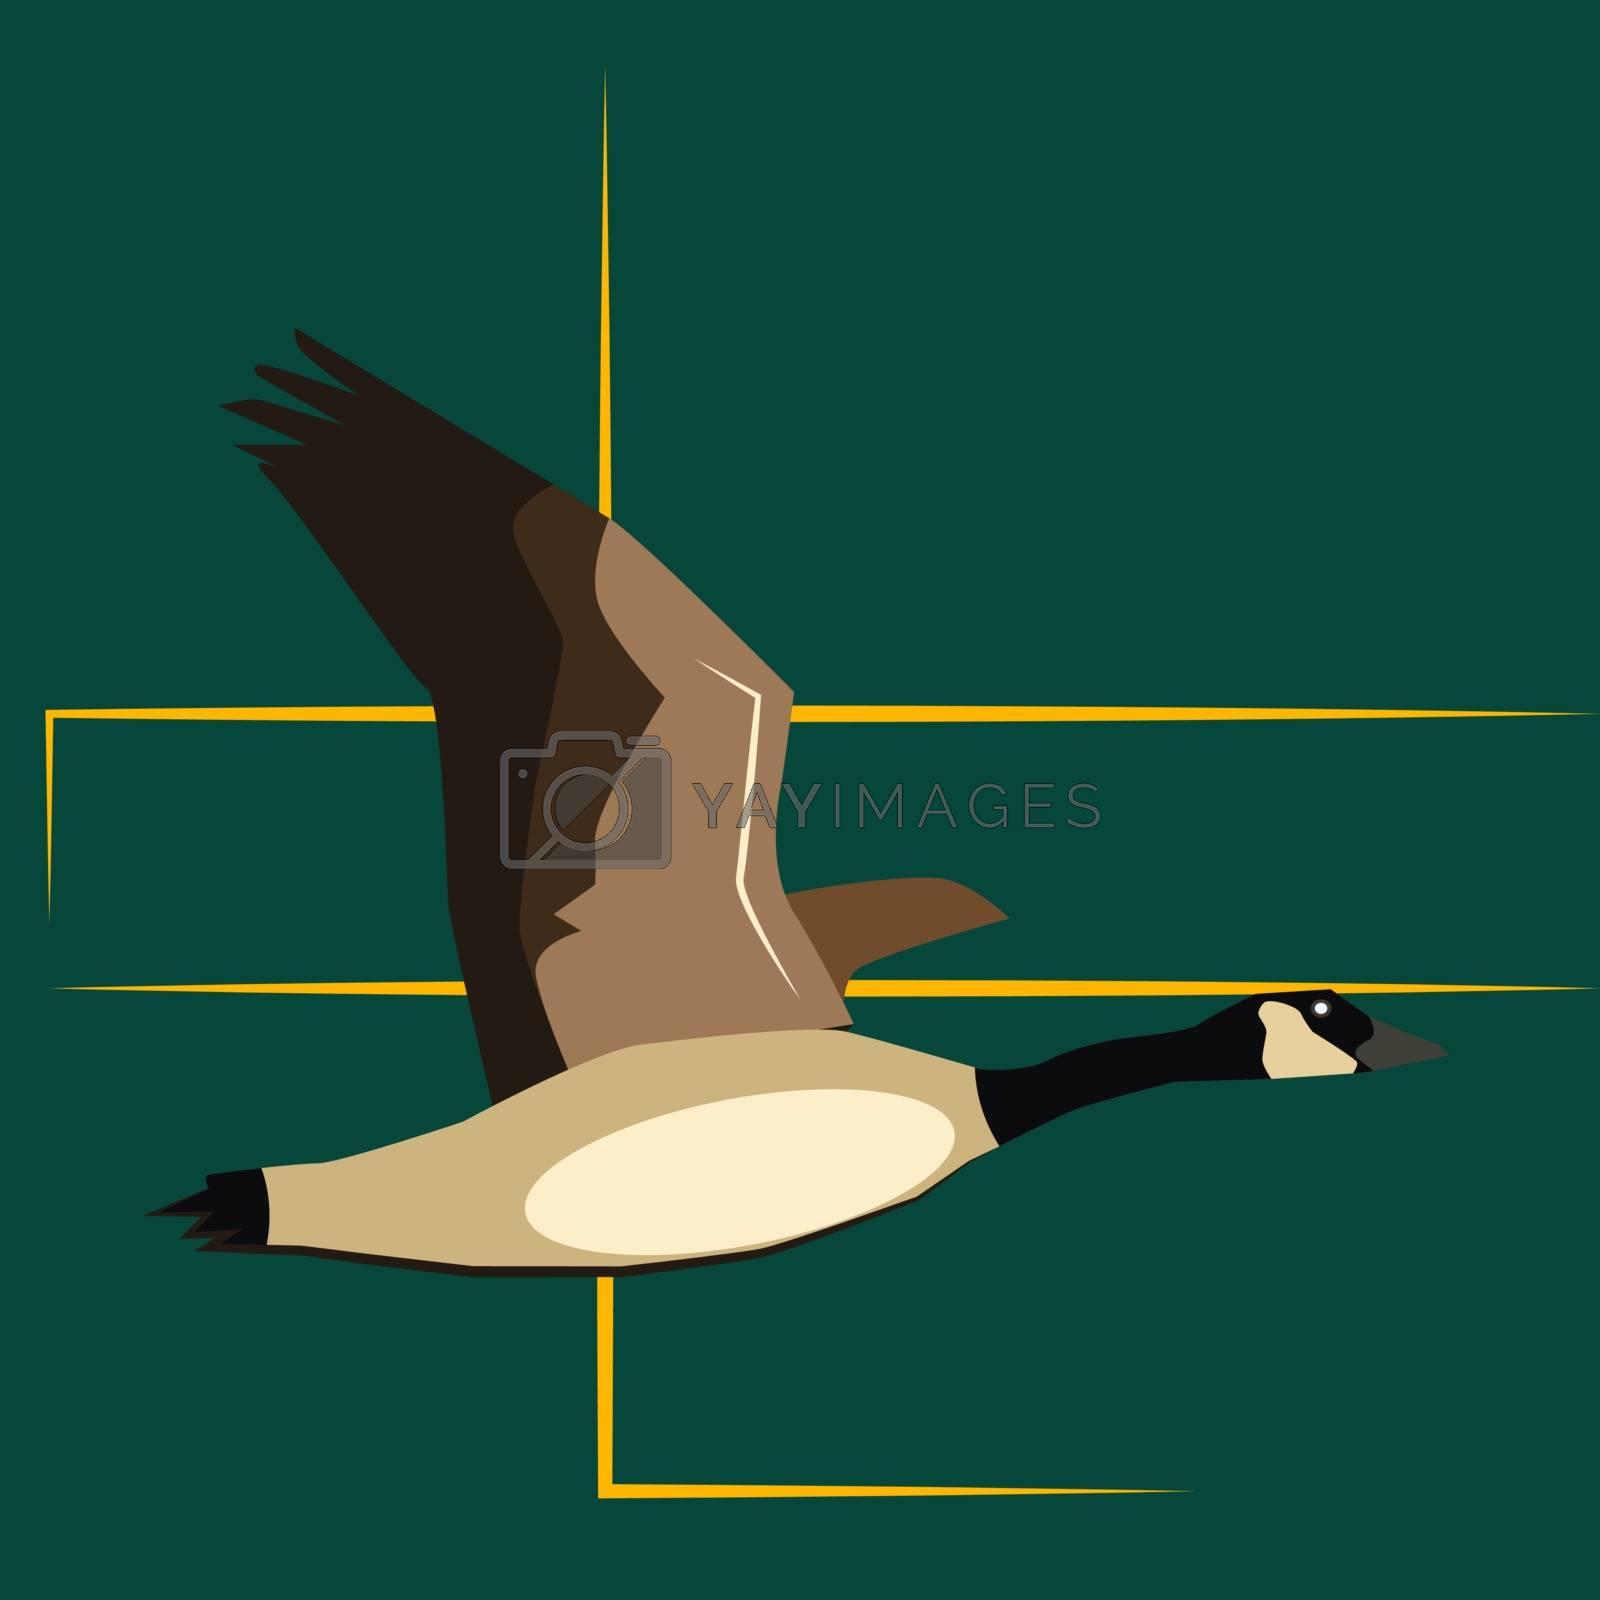 Goose, illustration, vector on white background.